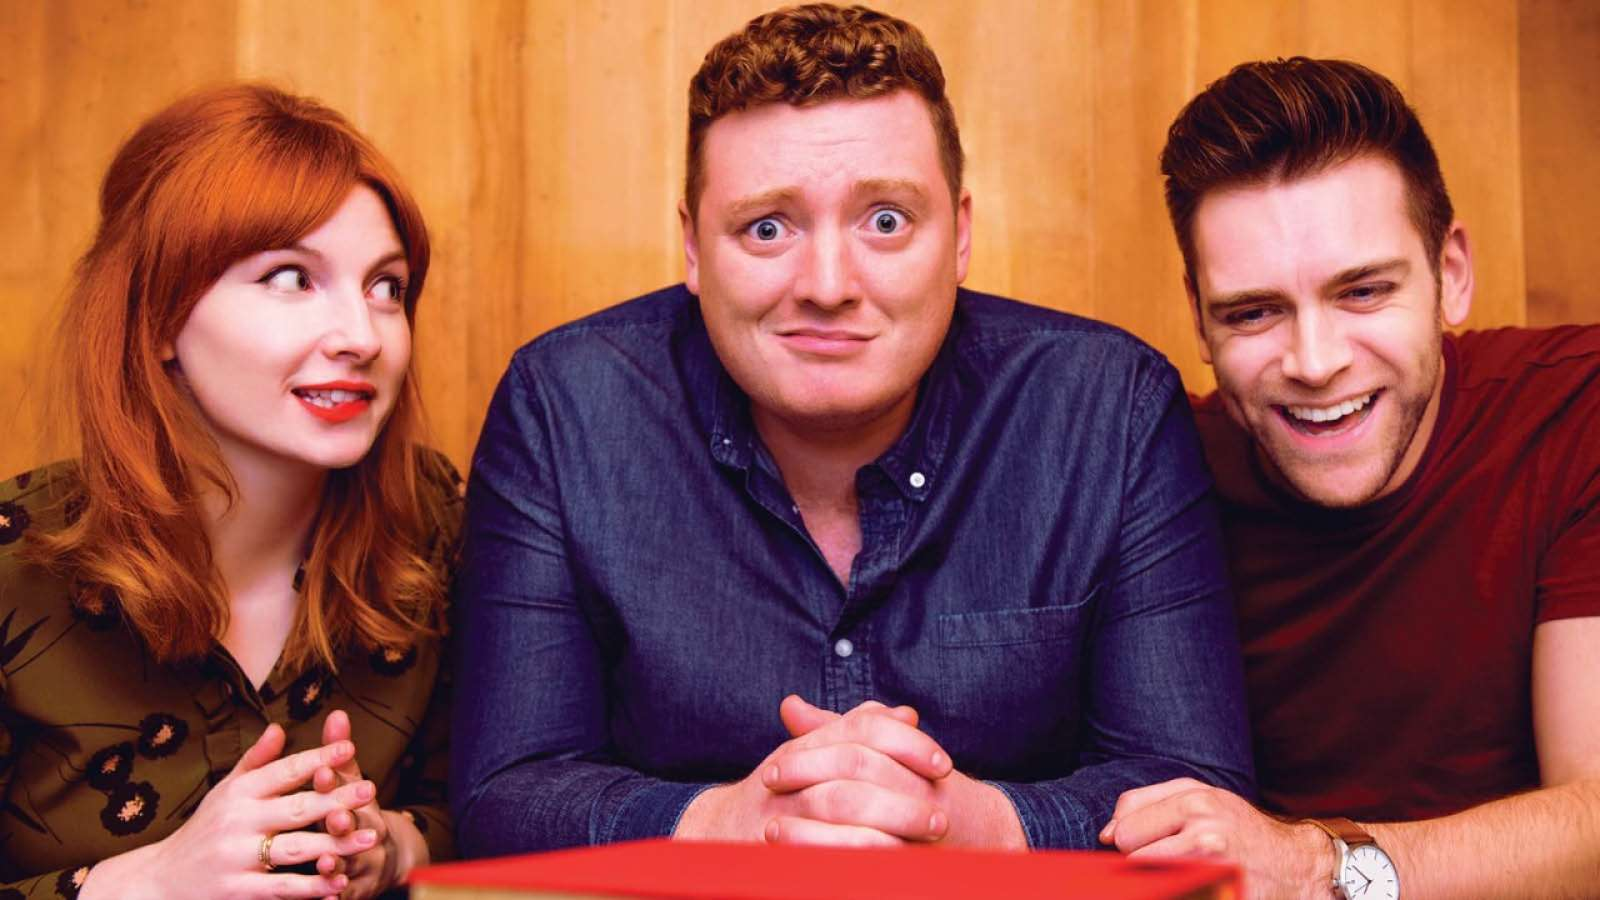 The podcast crew (L-R) Alice Levine, Jamie Morton and James Cooper